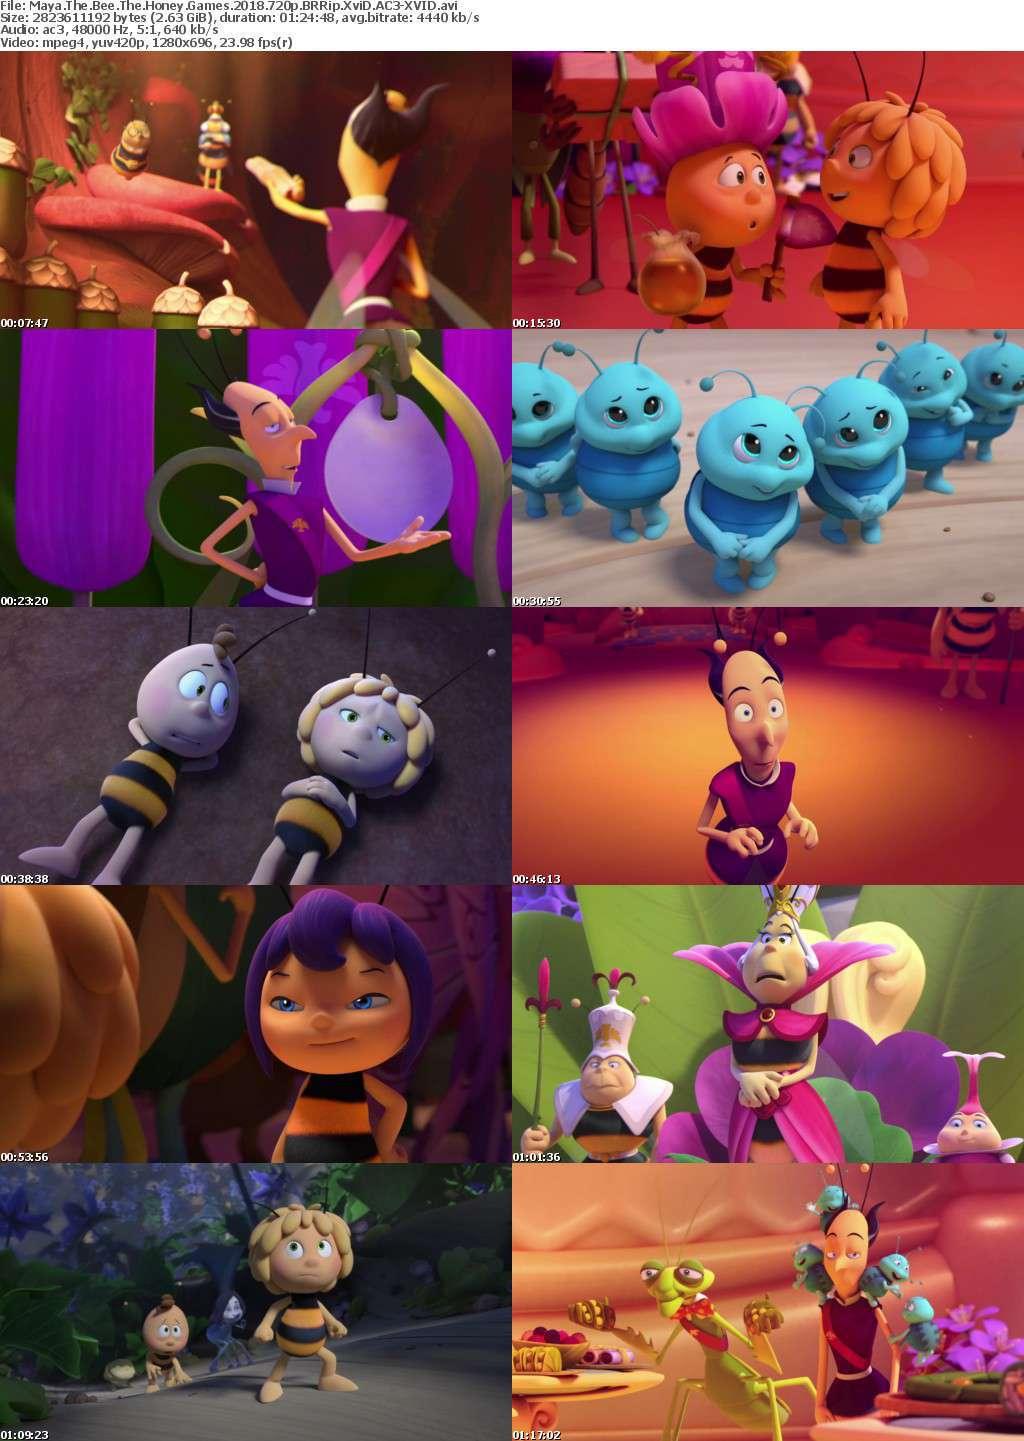 Maya The Bee The Honey Games 2018 720p BRRip XviD AC3-XVID